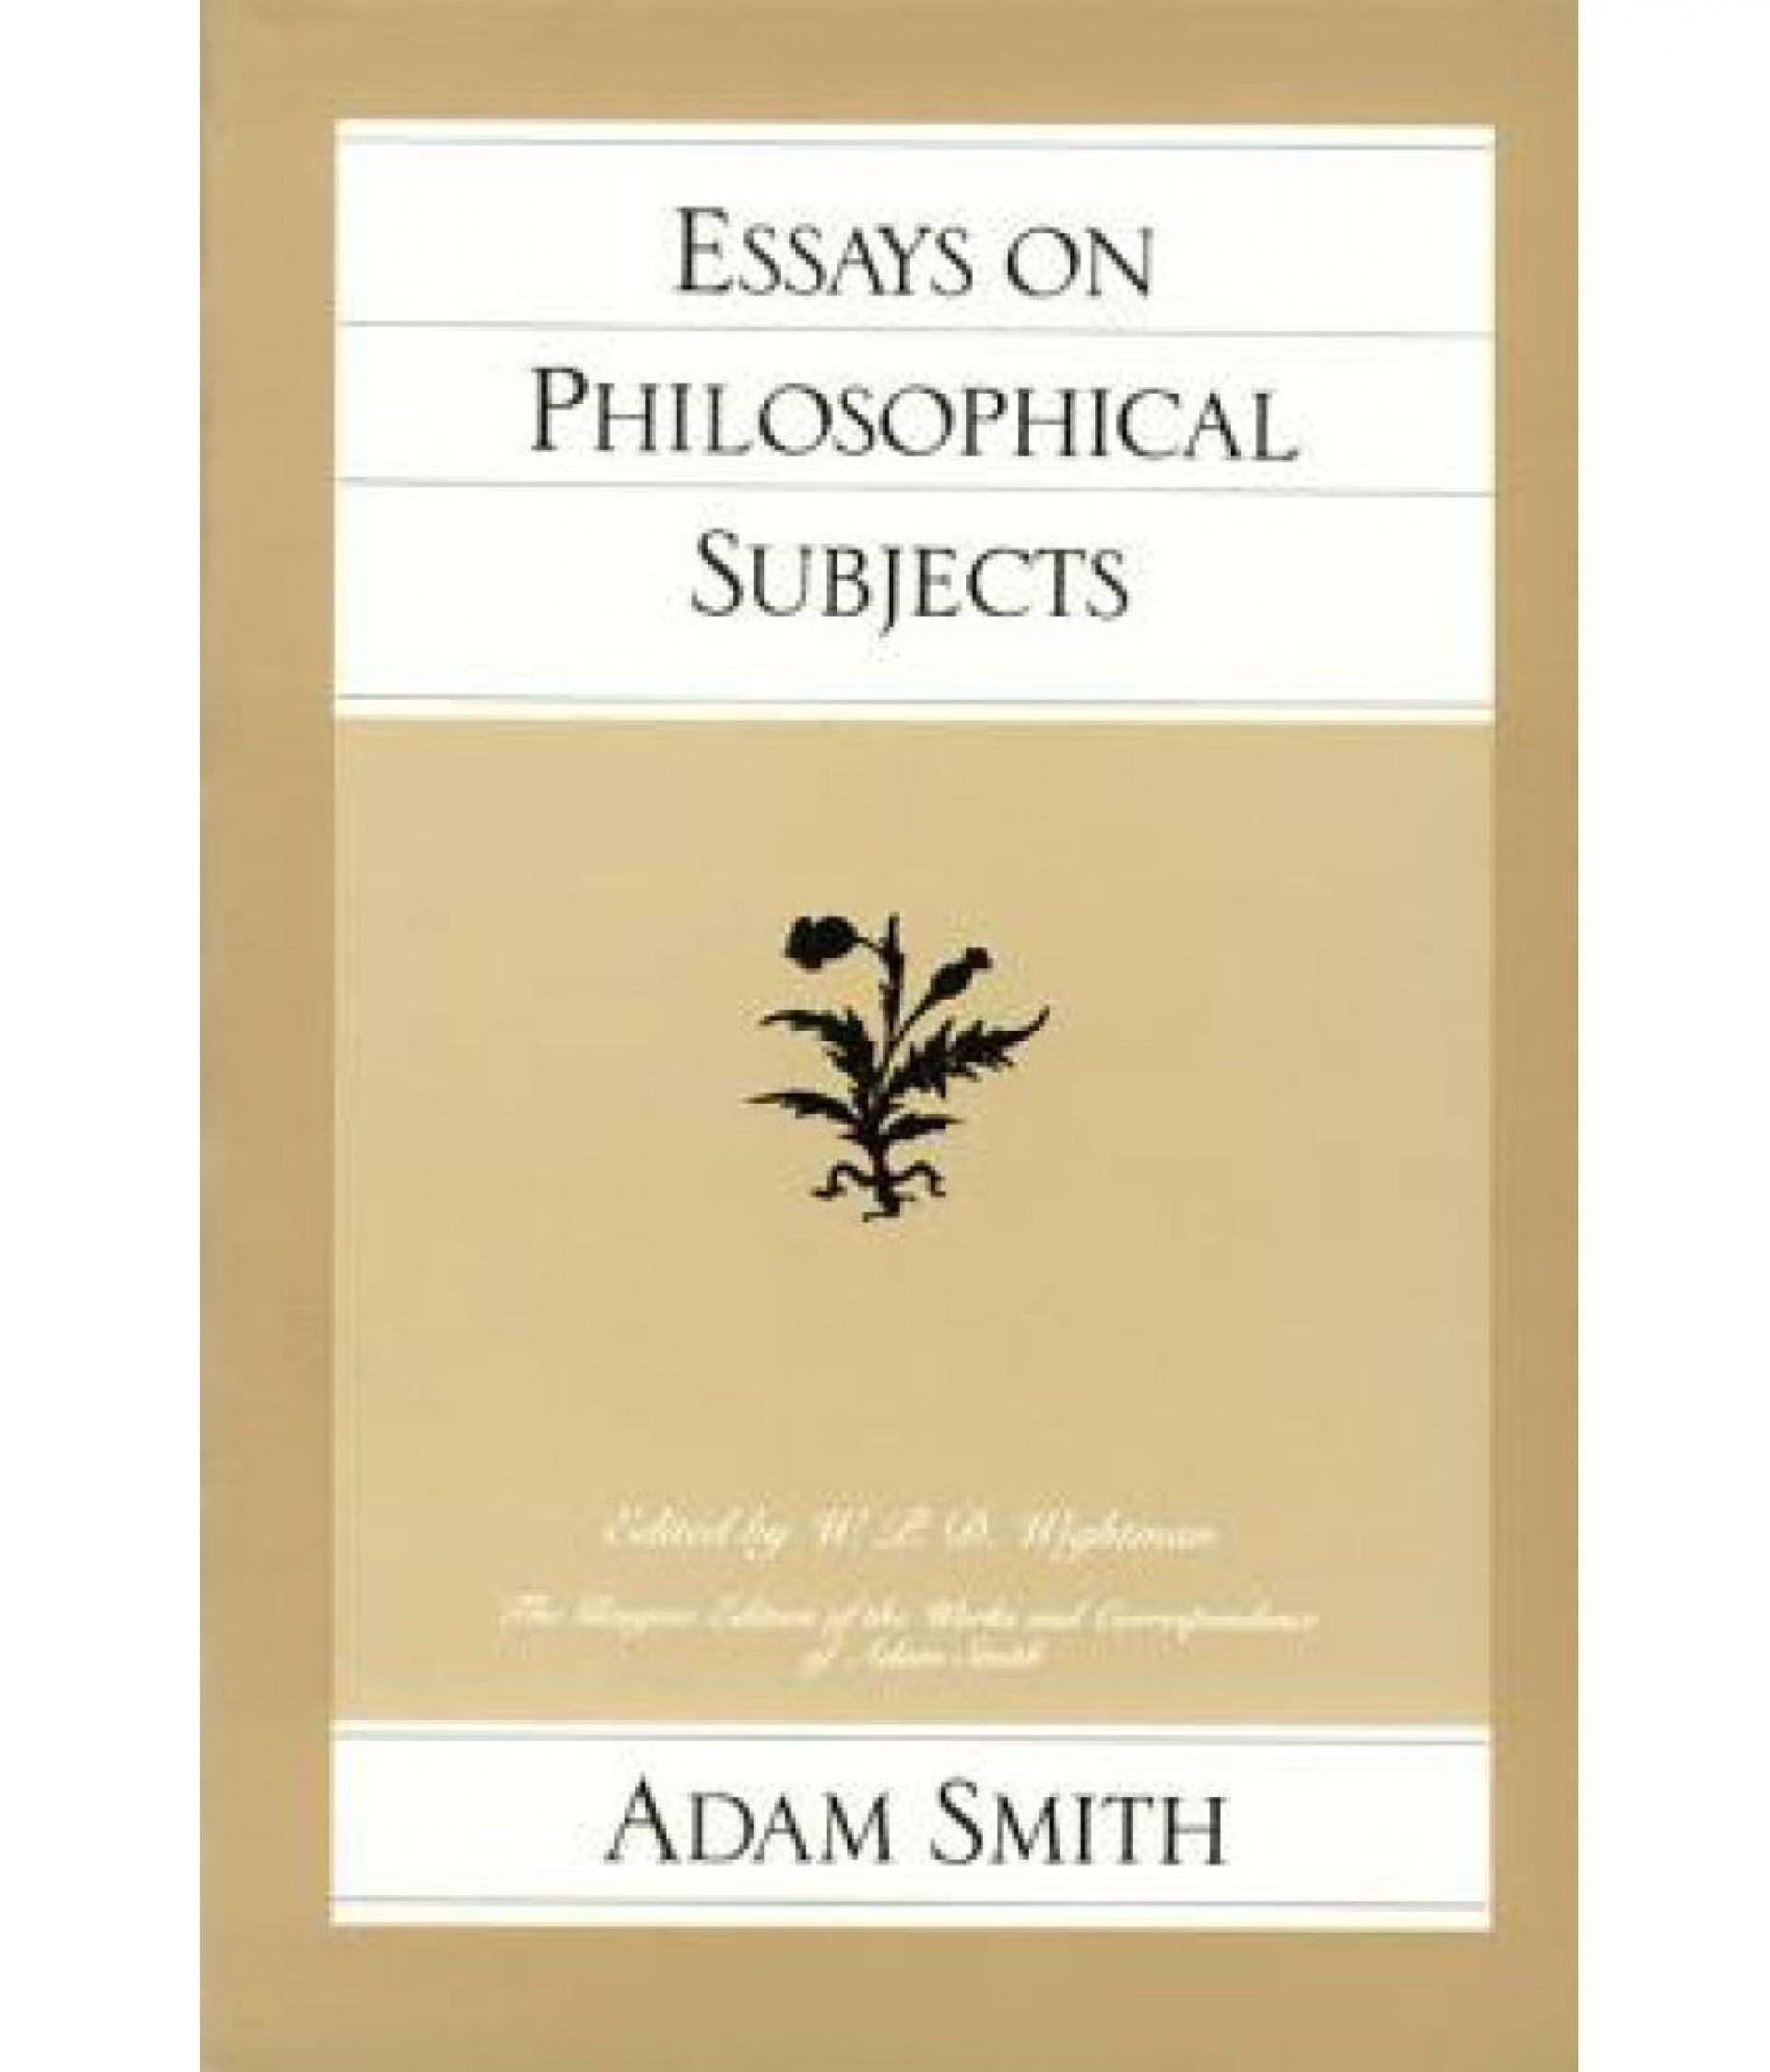 011 Essays On Philosophical Subjects Sdl274222681 Essay Best Smith Pdf 1920